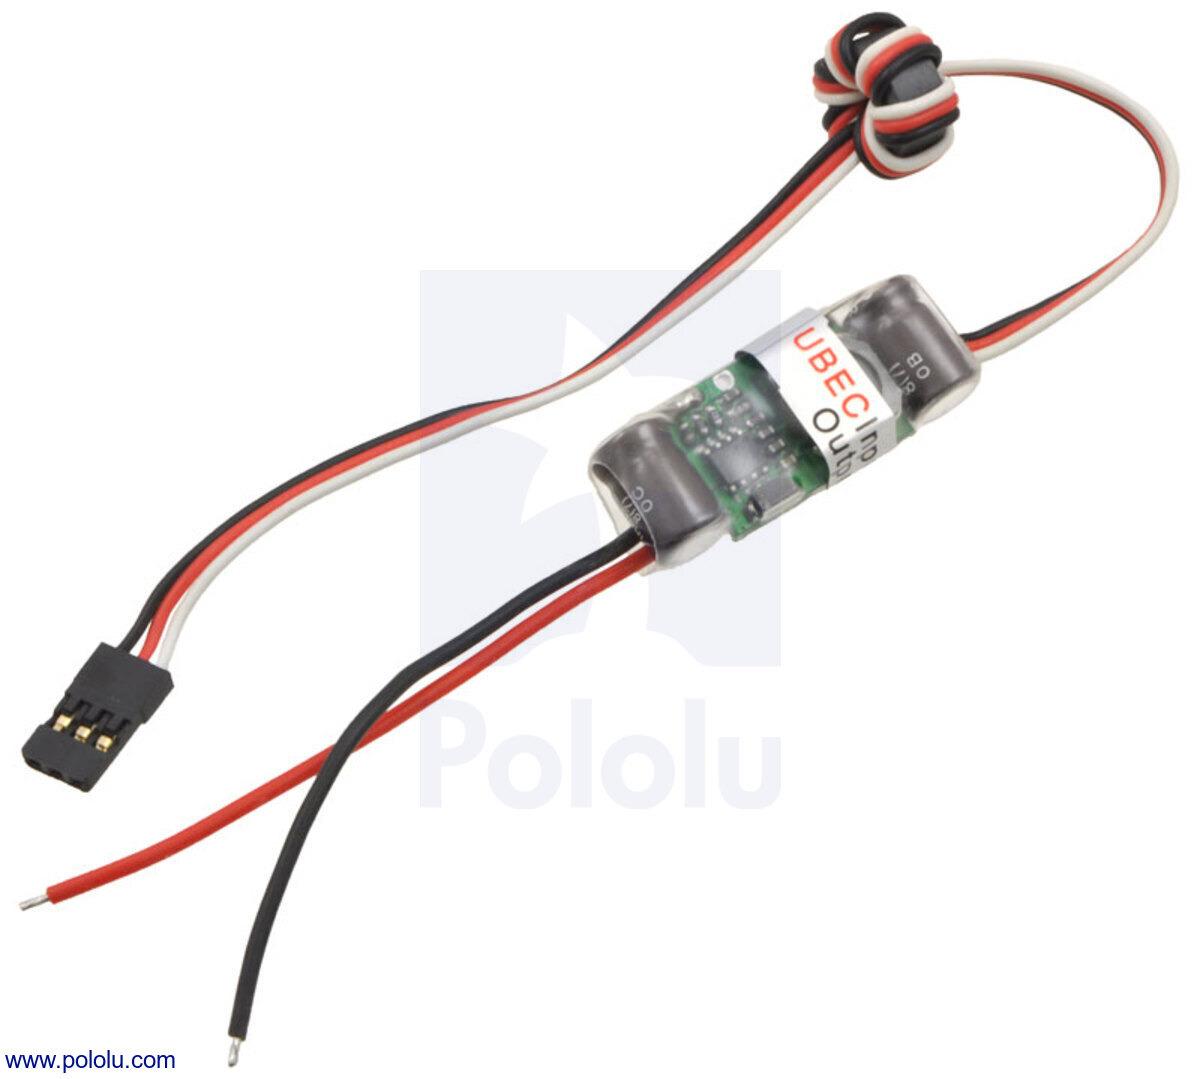 Pololu 5v 3a Bec Step Down Voltage Regulator Wiring New